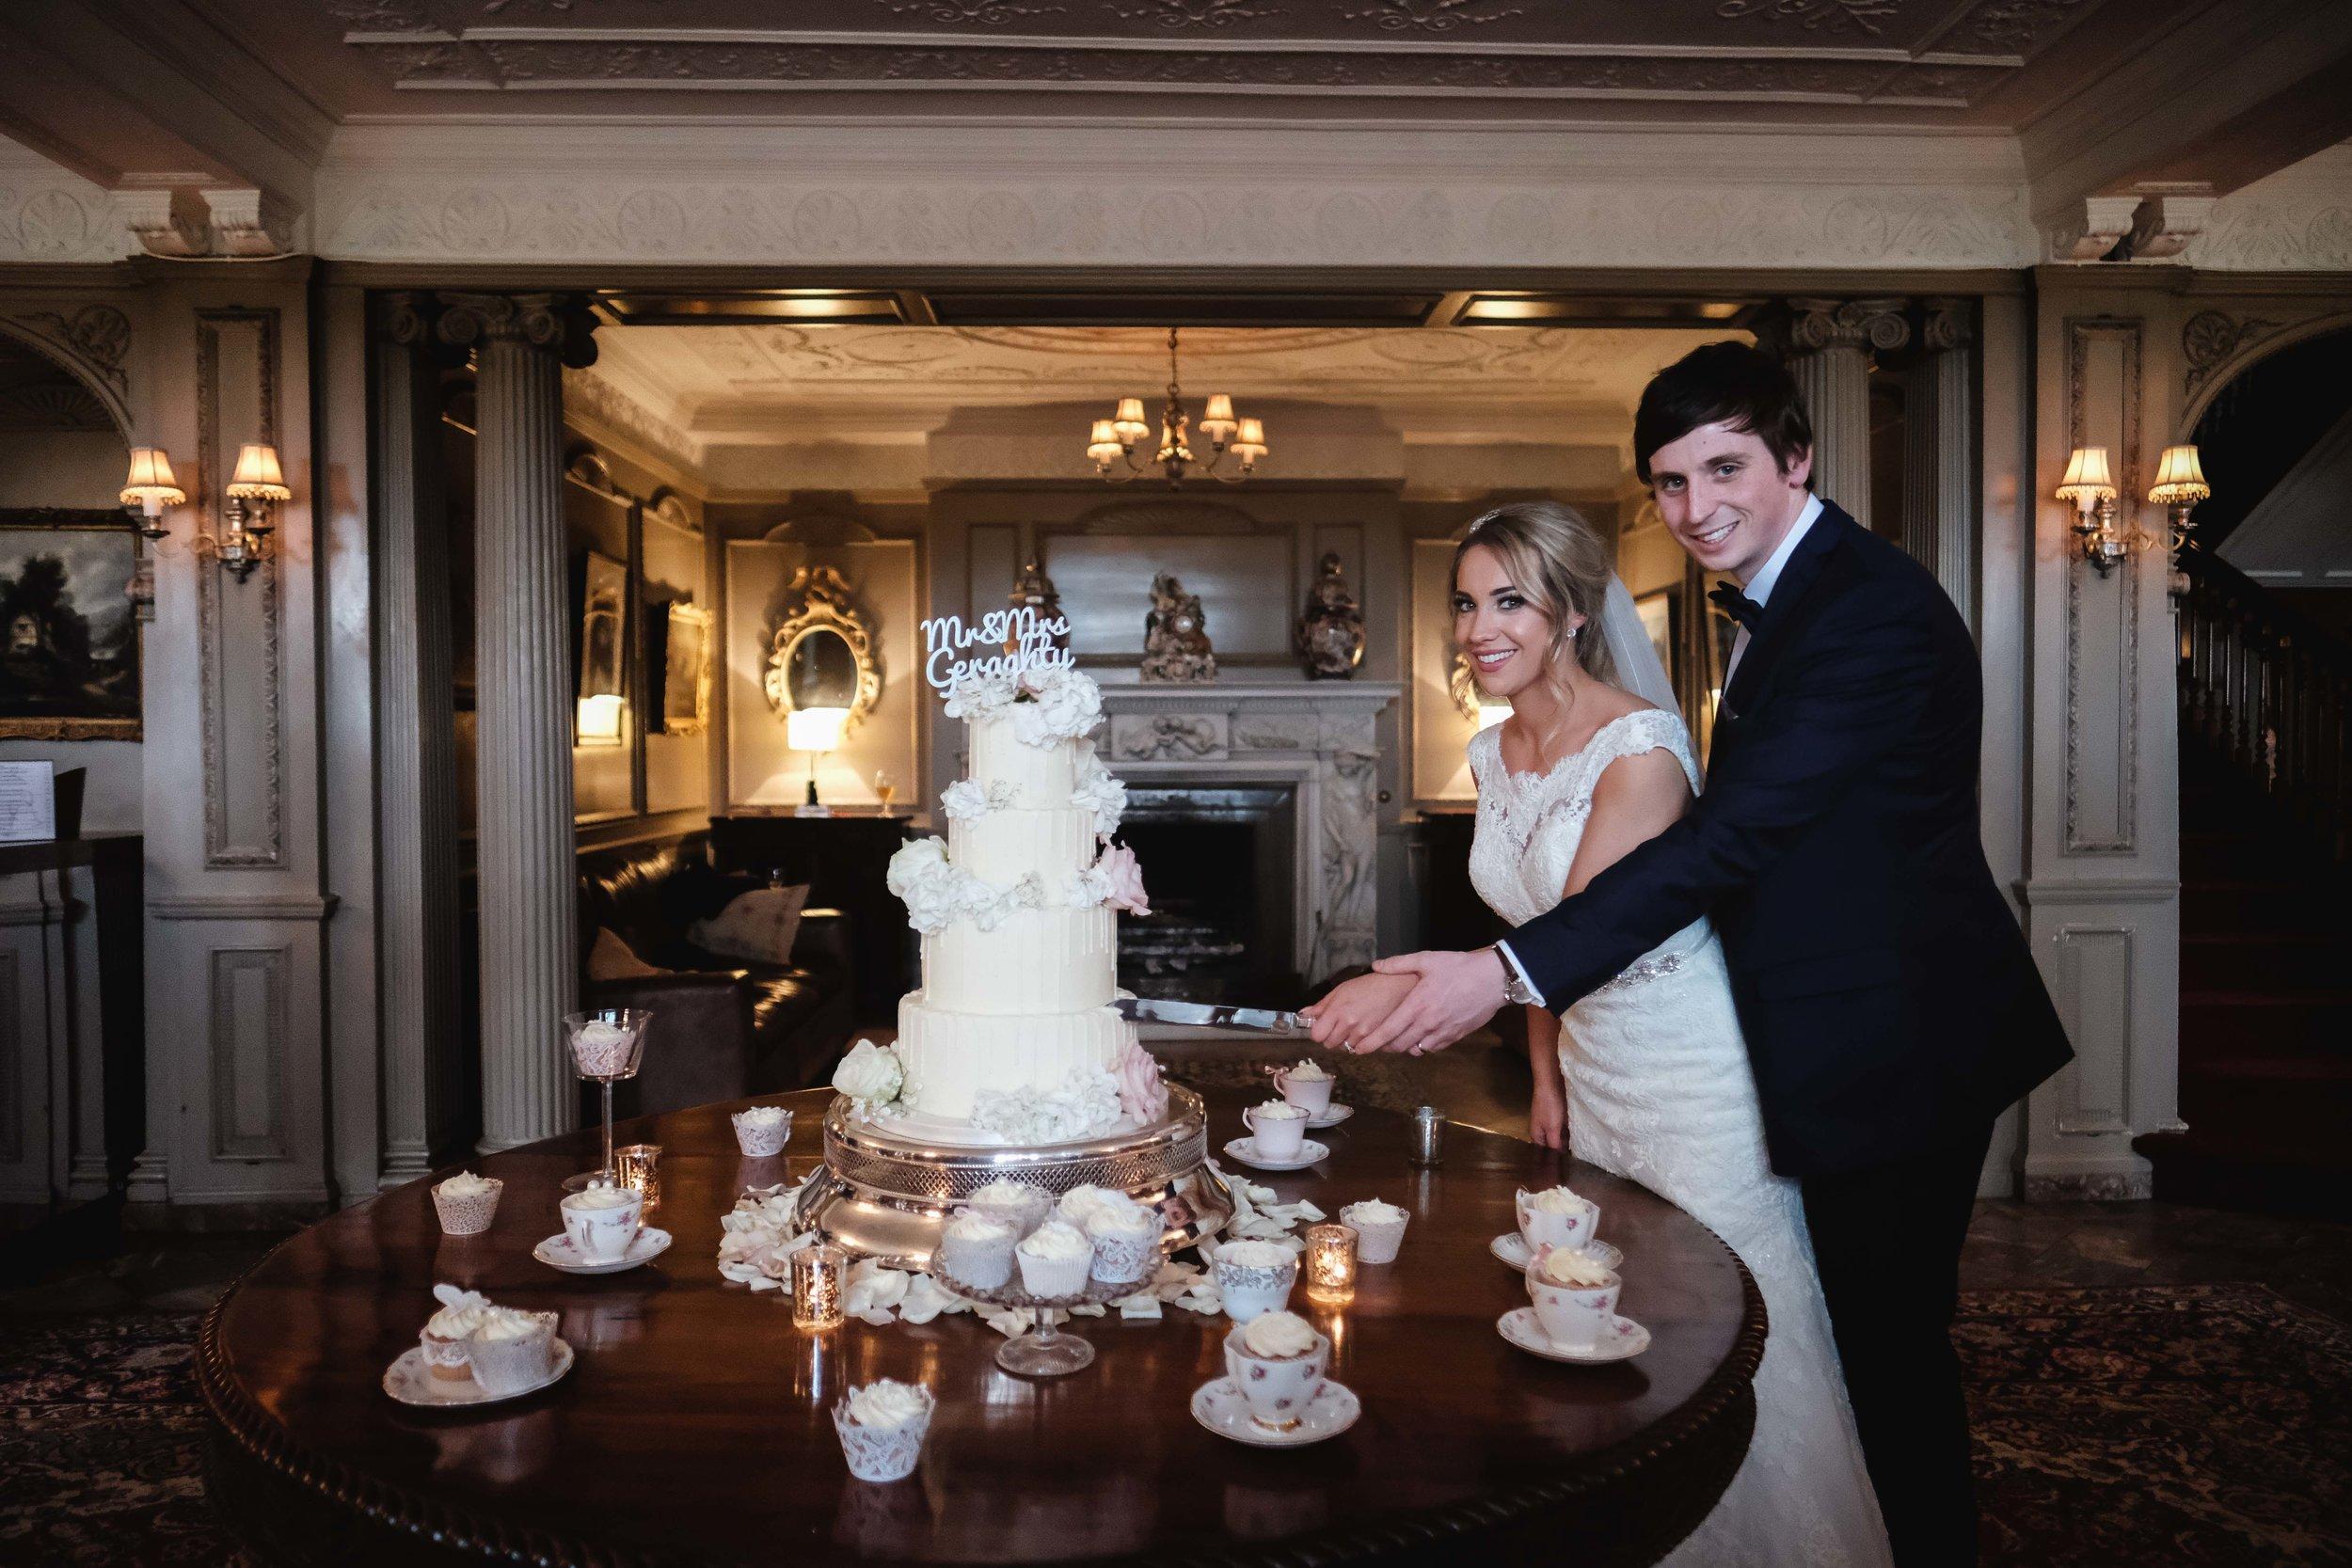 Thornton manor wedding photography cheshire wedding photographer liverpool manchester warrington chester wirral wedding BLOG (75 of 108).jpg